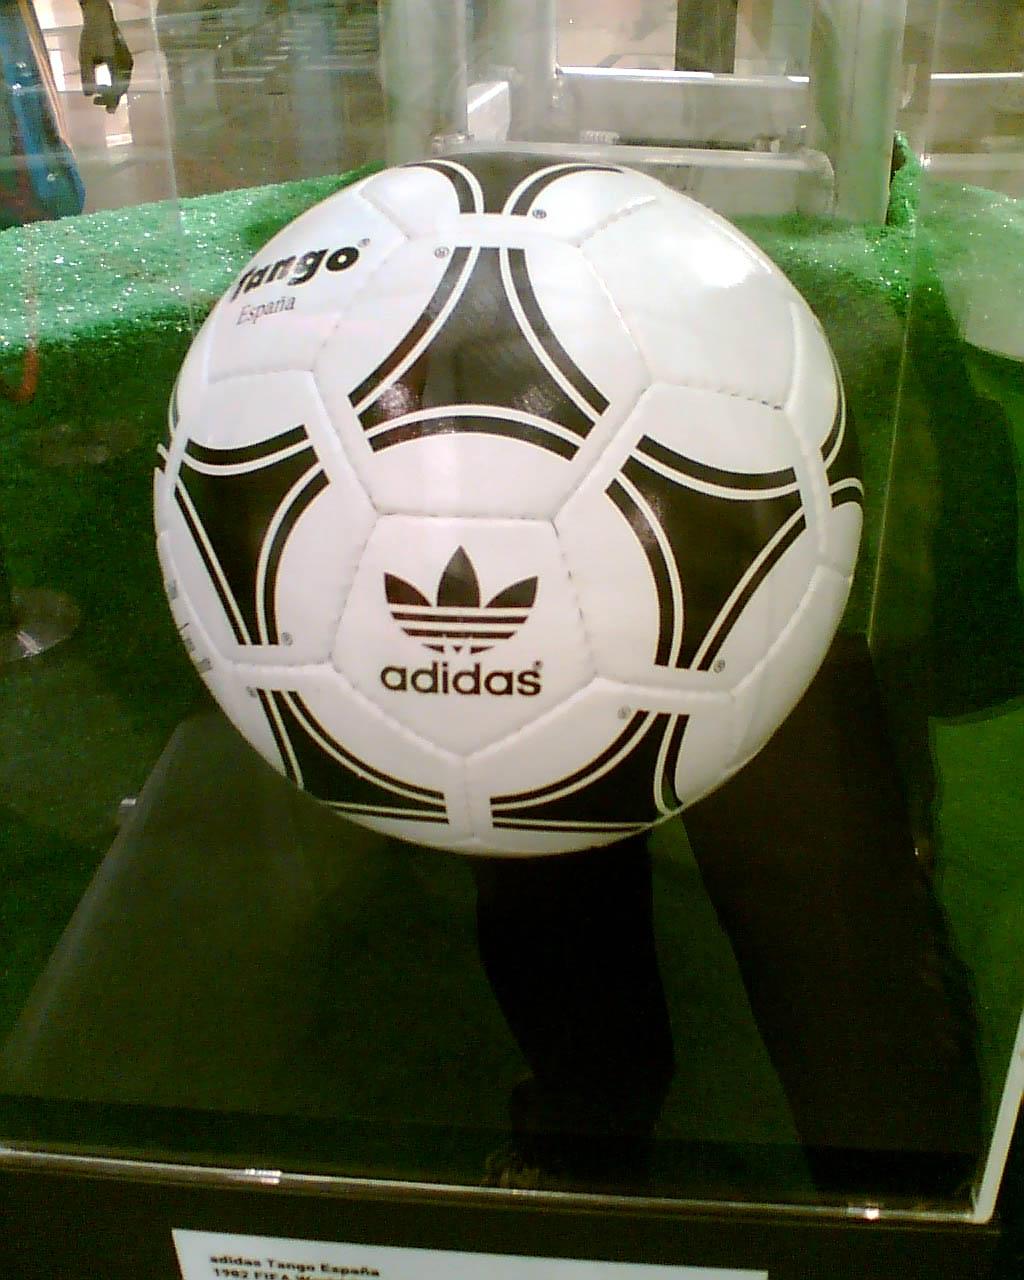 adidas voetbal wikipedia